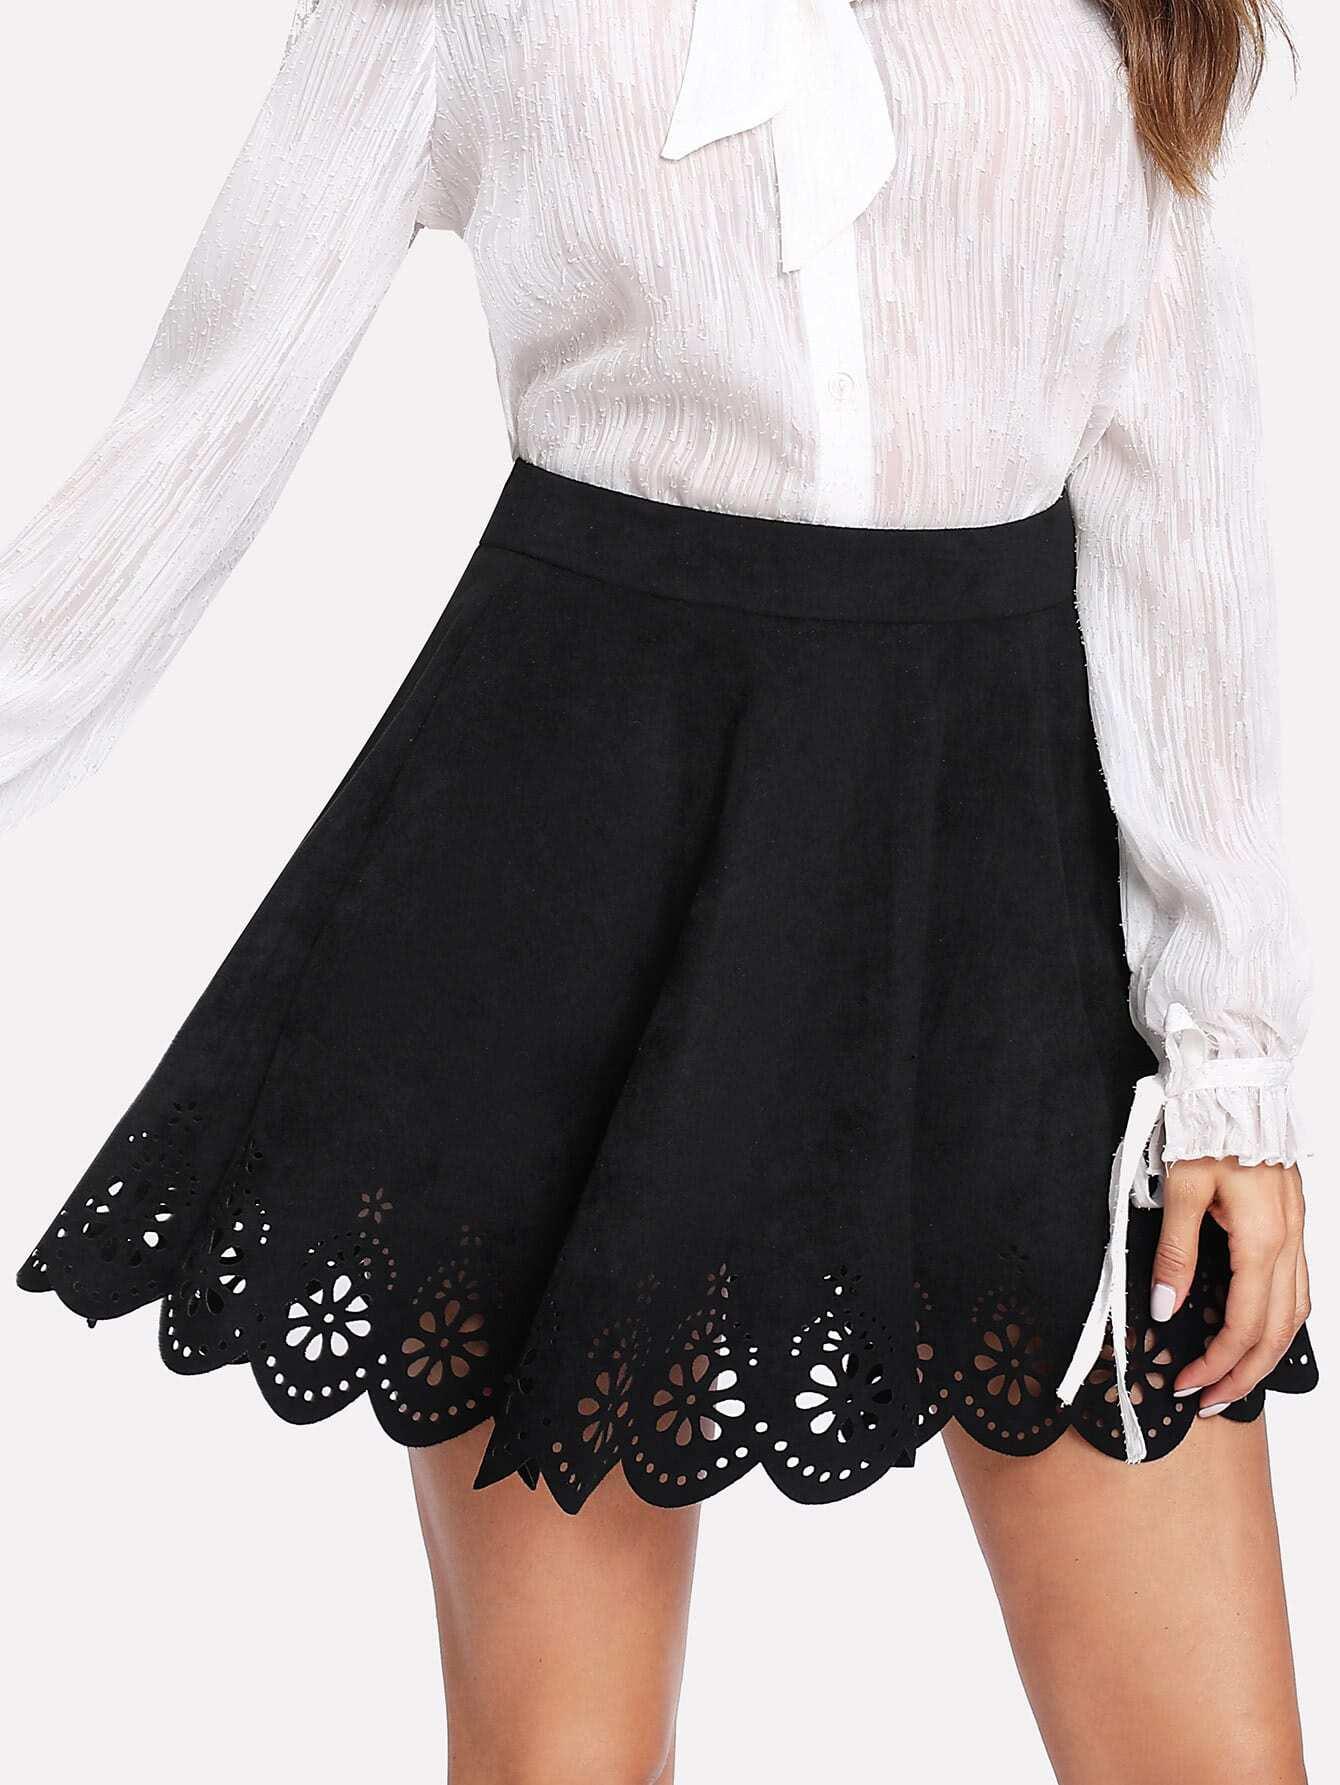 Scallop Laser Cut Suede Skirt scallop laser cut form fitting dress